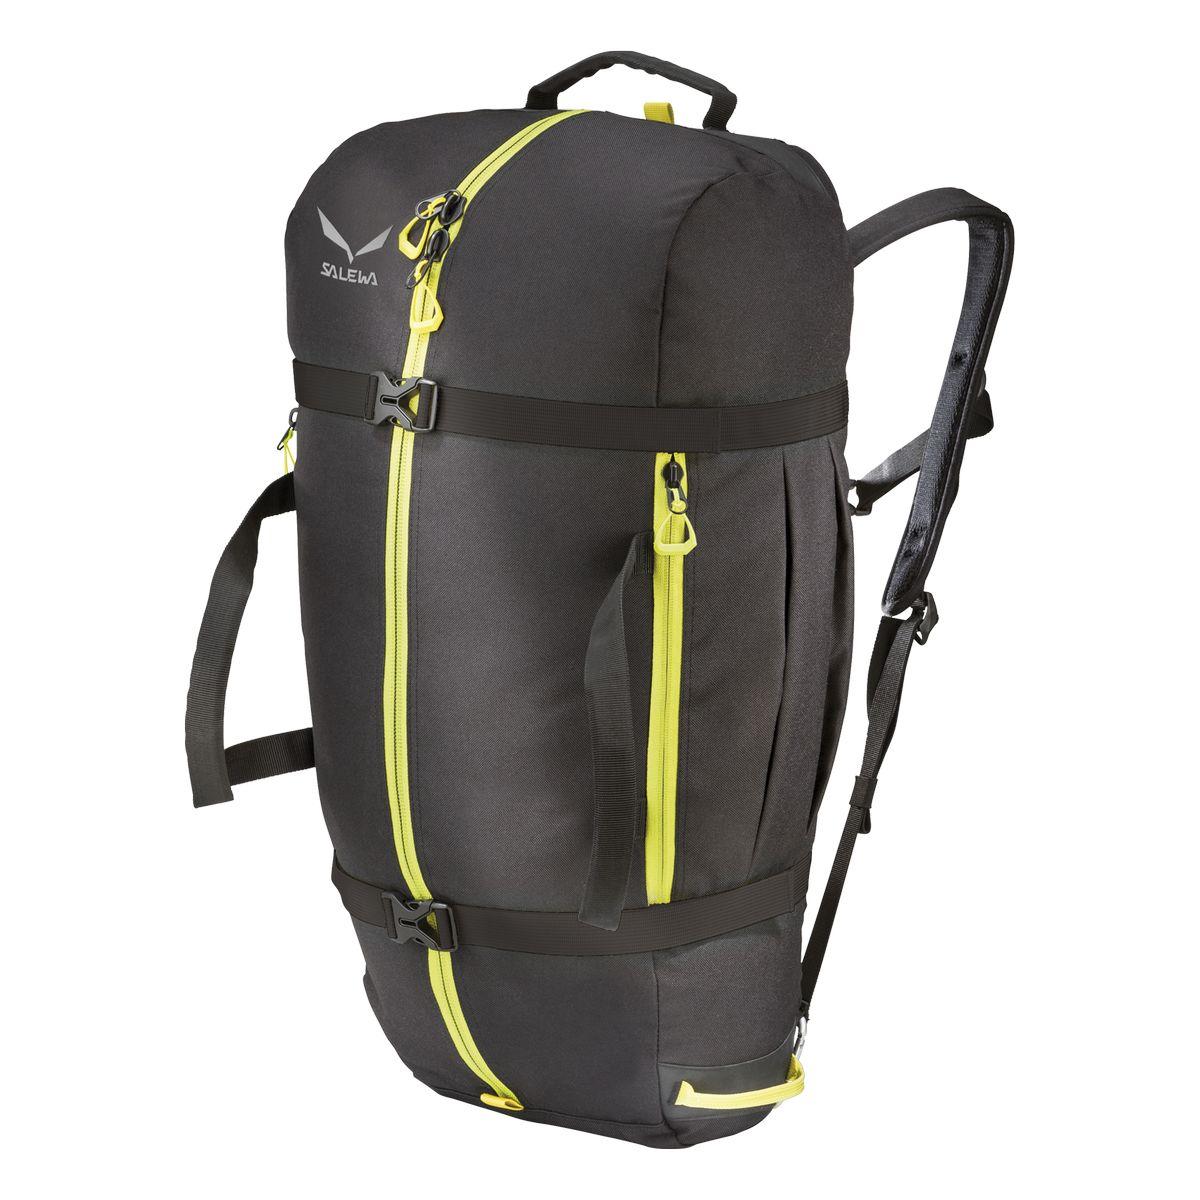 Купить Рюкзак туристический Salewa 2017 Ropebag XL black/ citro, Рюкзаки туристические, 1241133